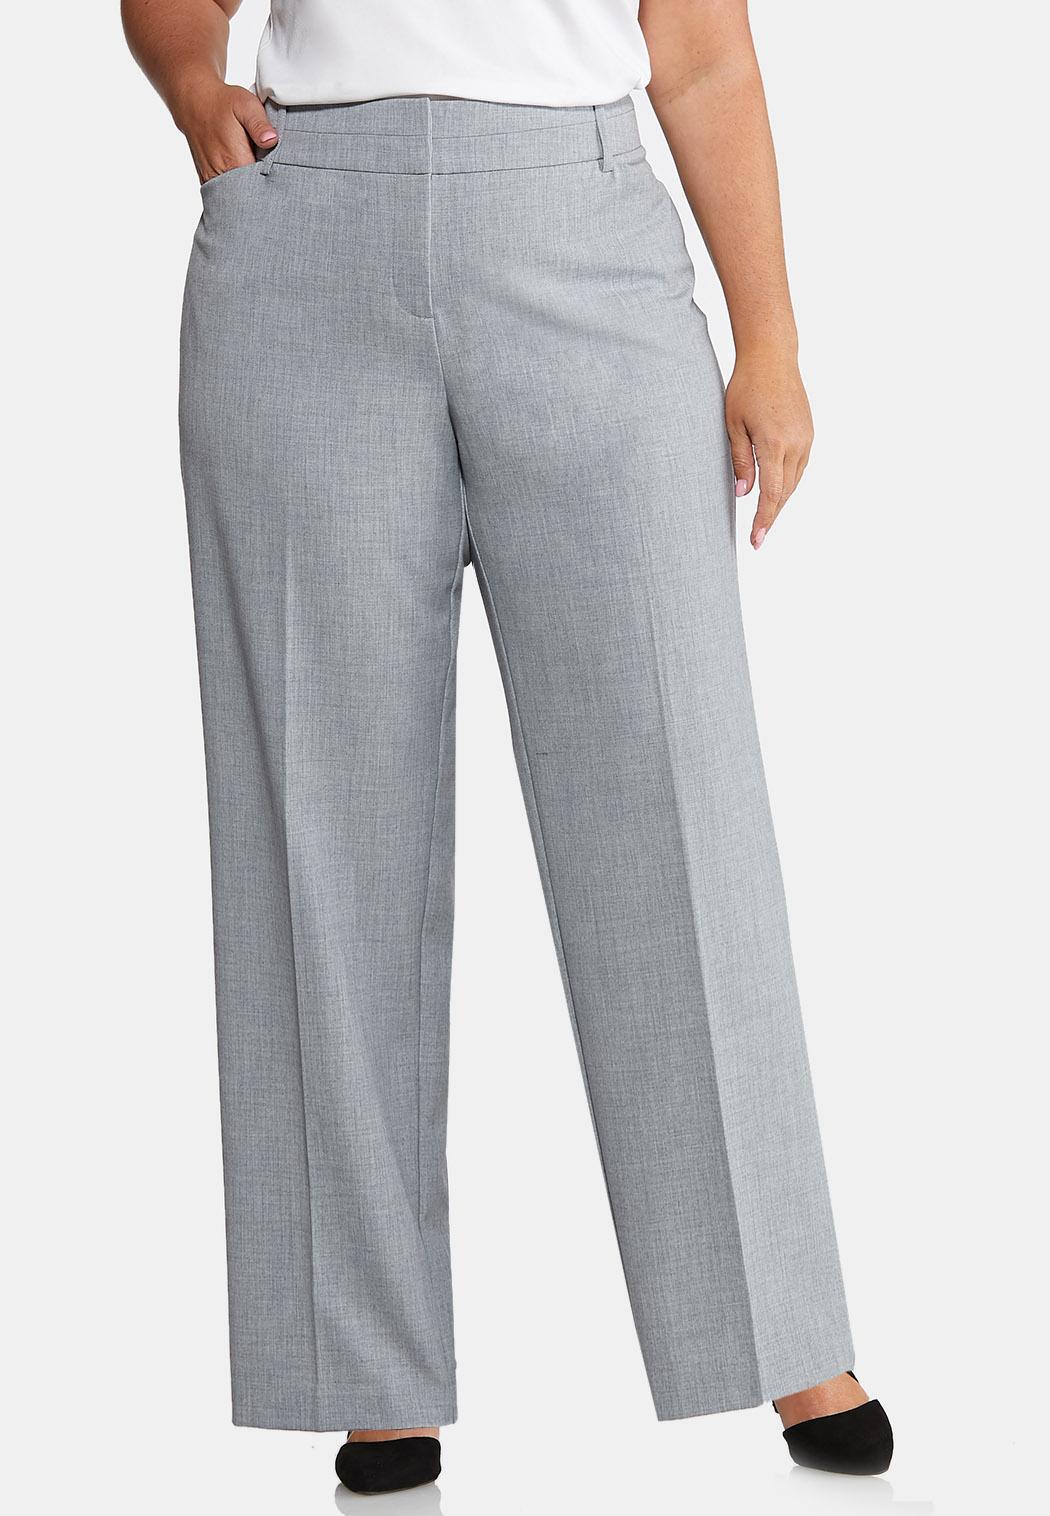 Plus Petite Curvy Shape Enhancing Trouser Pants